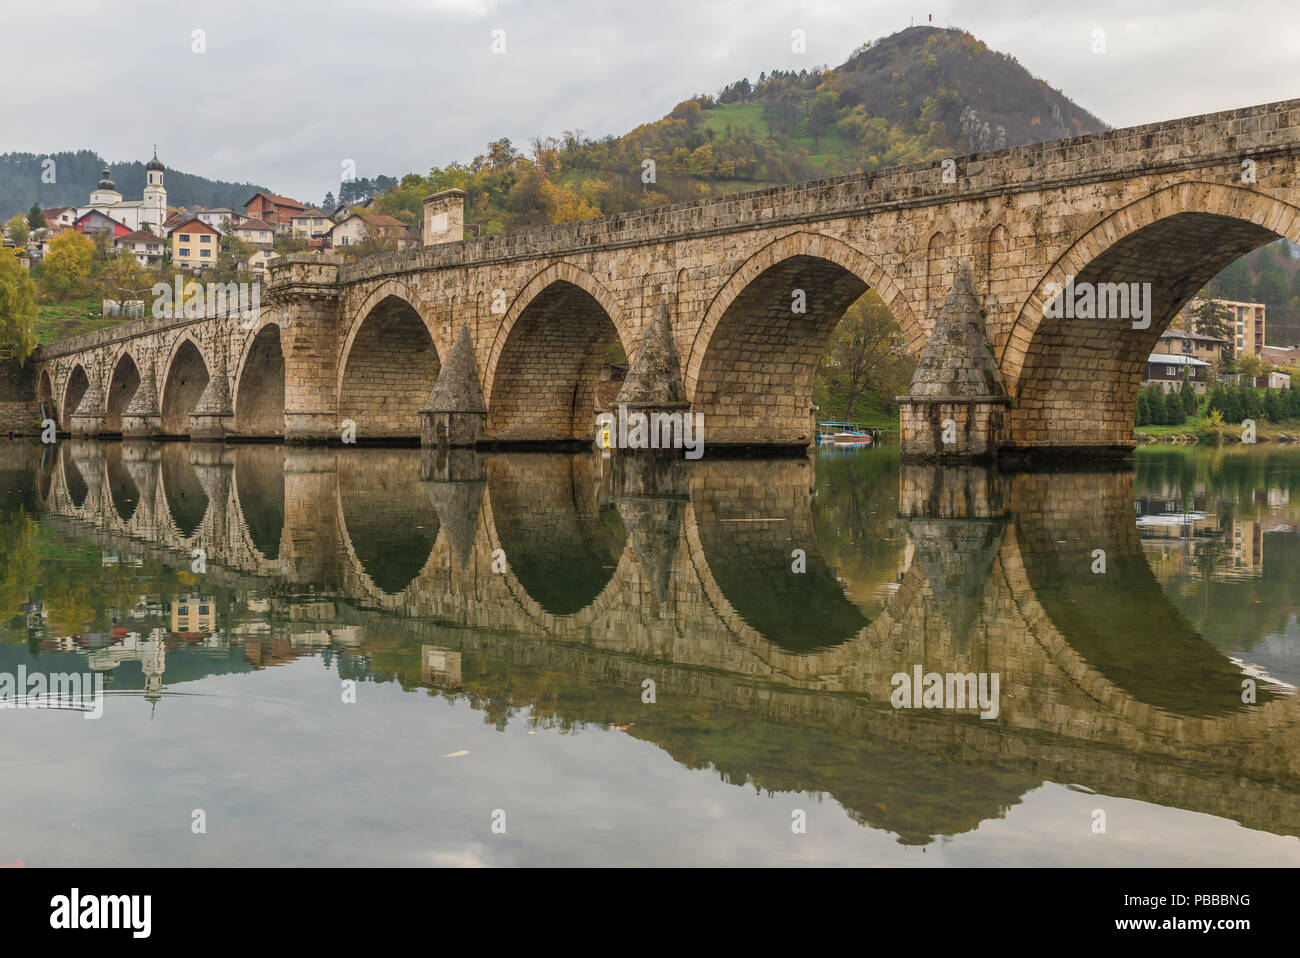 Visegrad, Bosnia & Herzegovina - the Mehmed Paša Bridge is one of the main landmarks in the country, and Visegrad one of the pearls of the Balkans - Stock Image